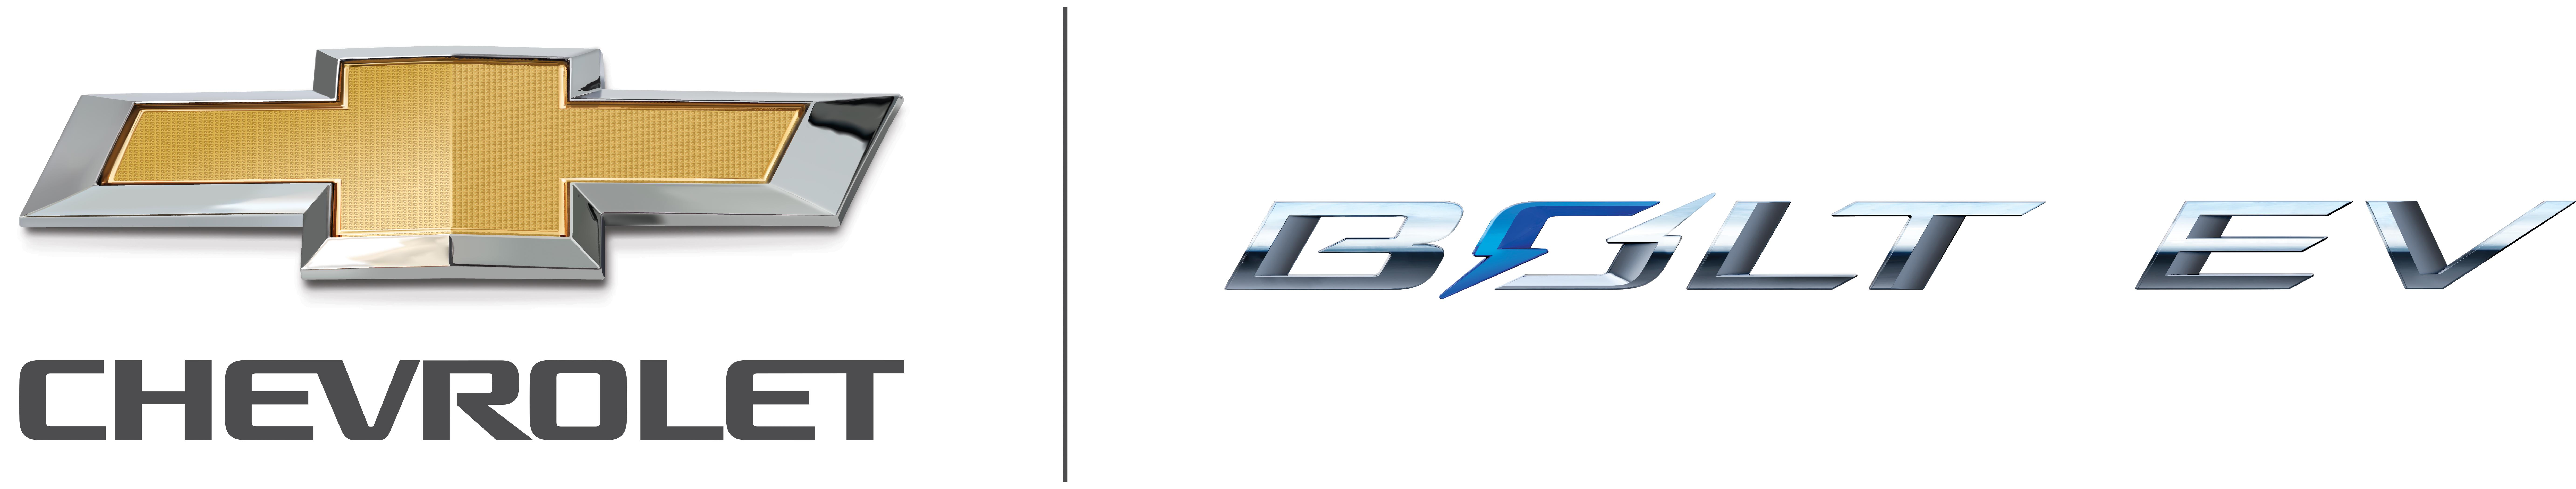 Chevrolet Bolt Ev Will Debut At Ces